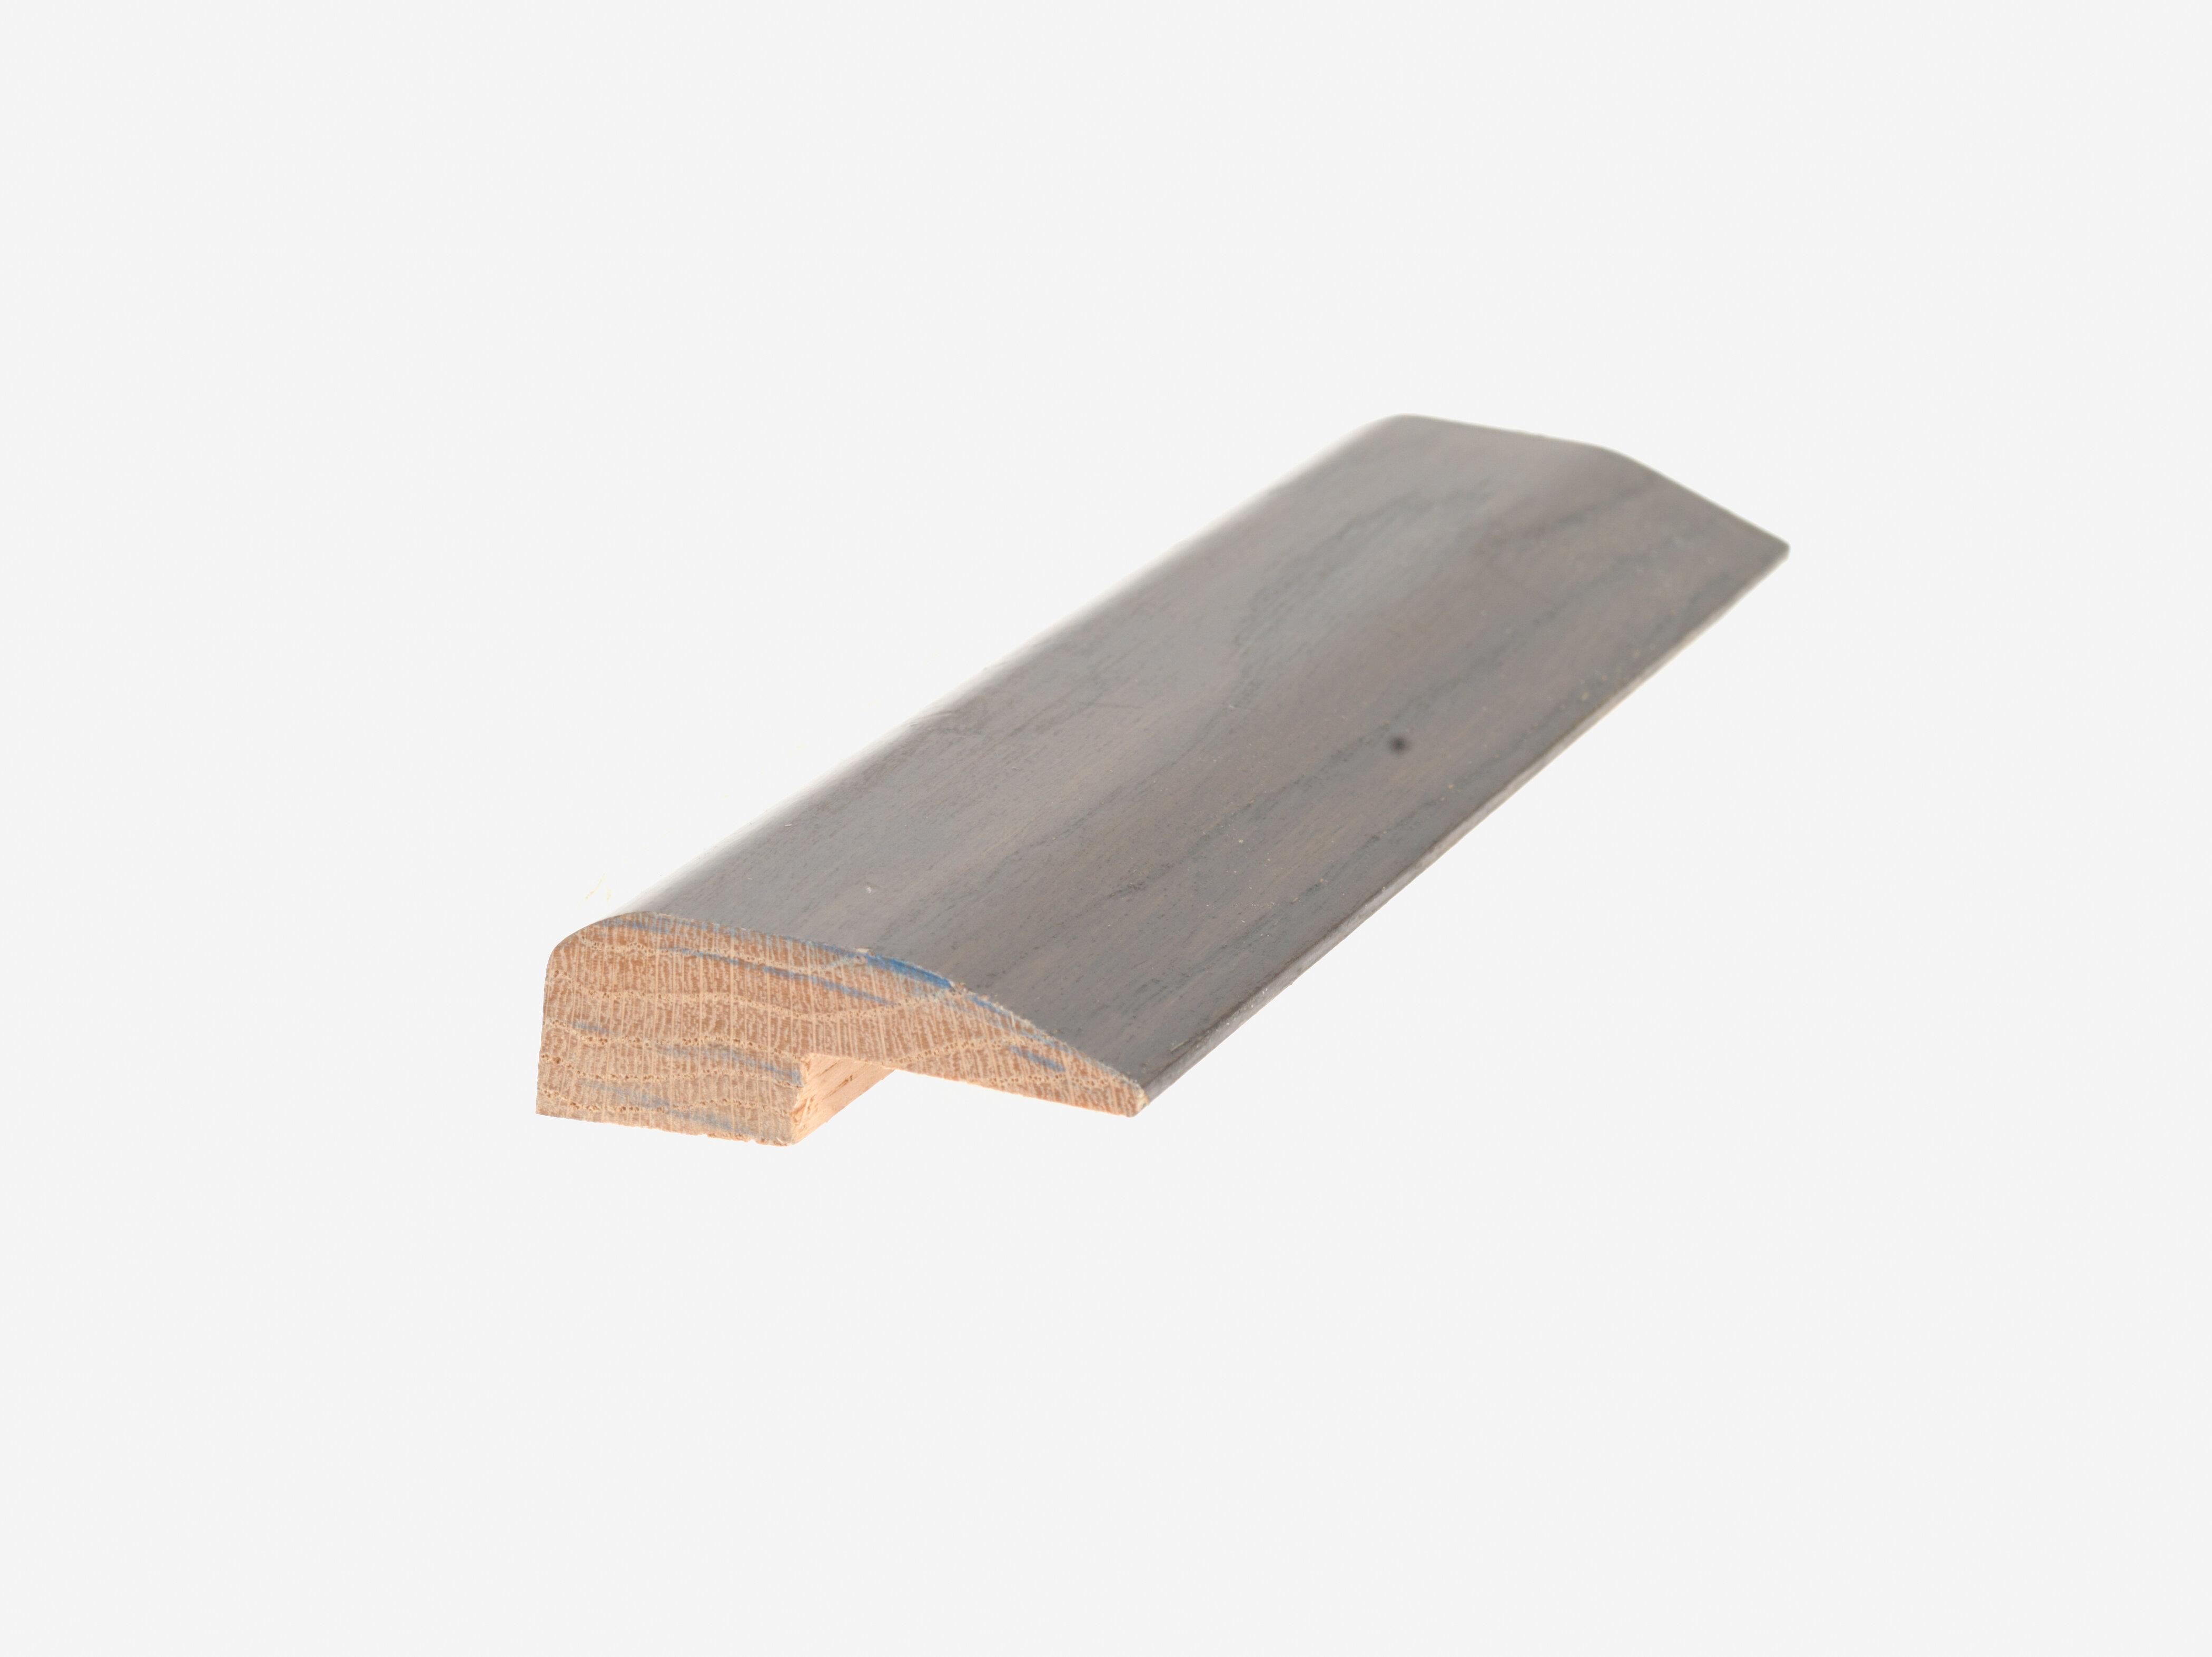 Mohawk Oak Wood 0 78 Thick X 2 Wide X 84 Length Threshold End Cap In Oak Shale Wayfair